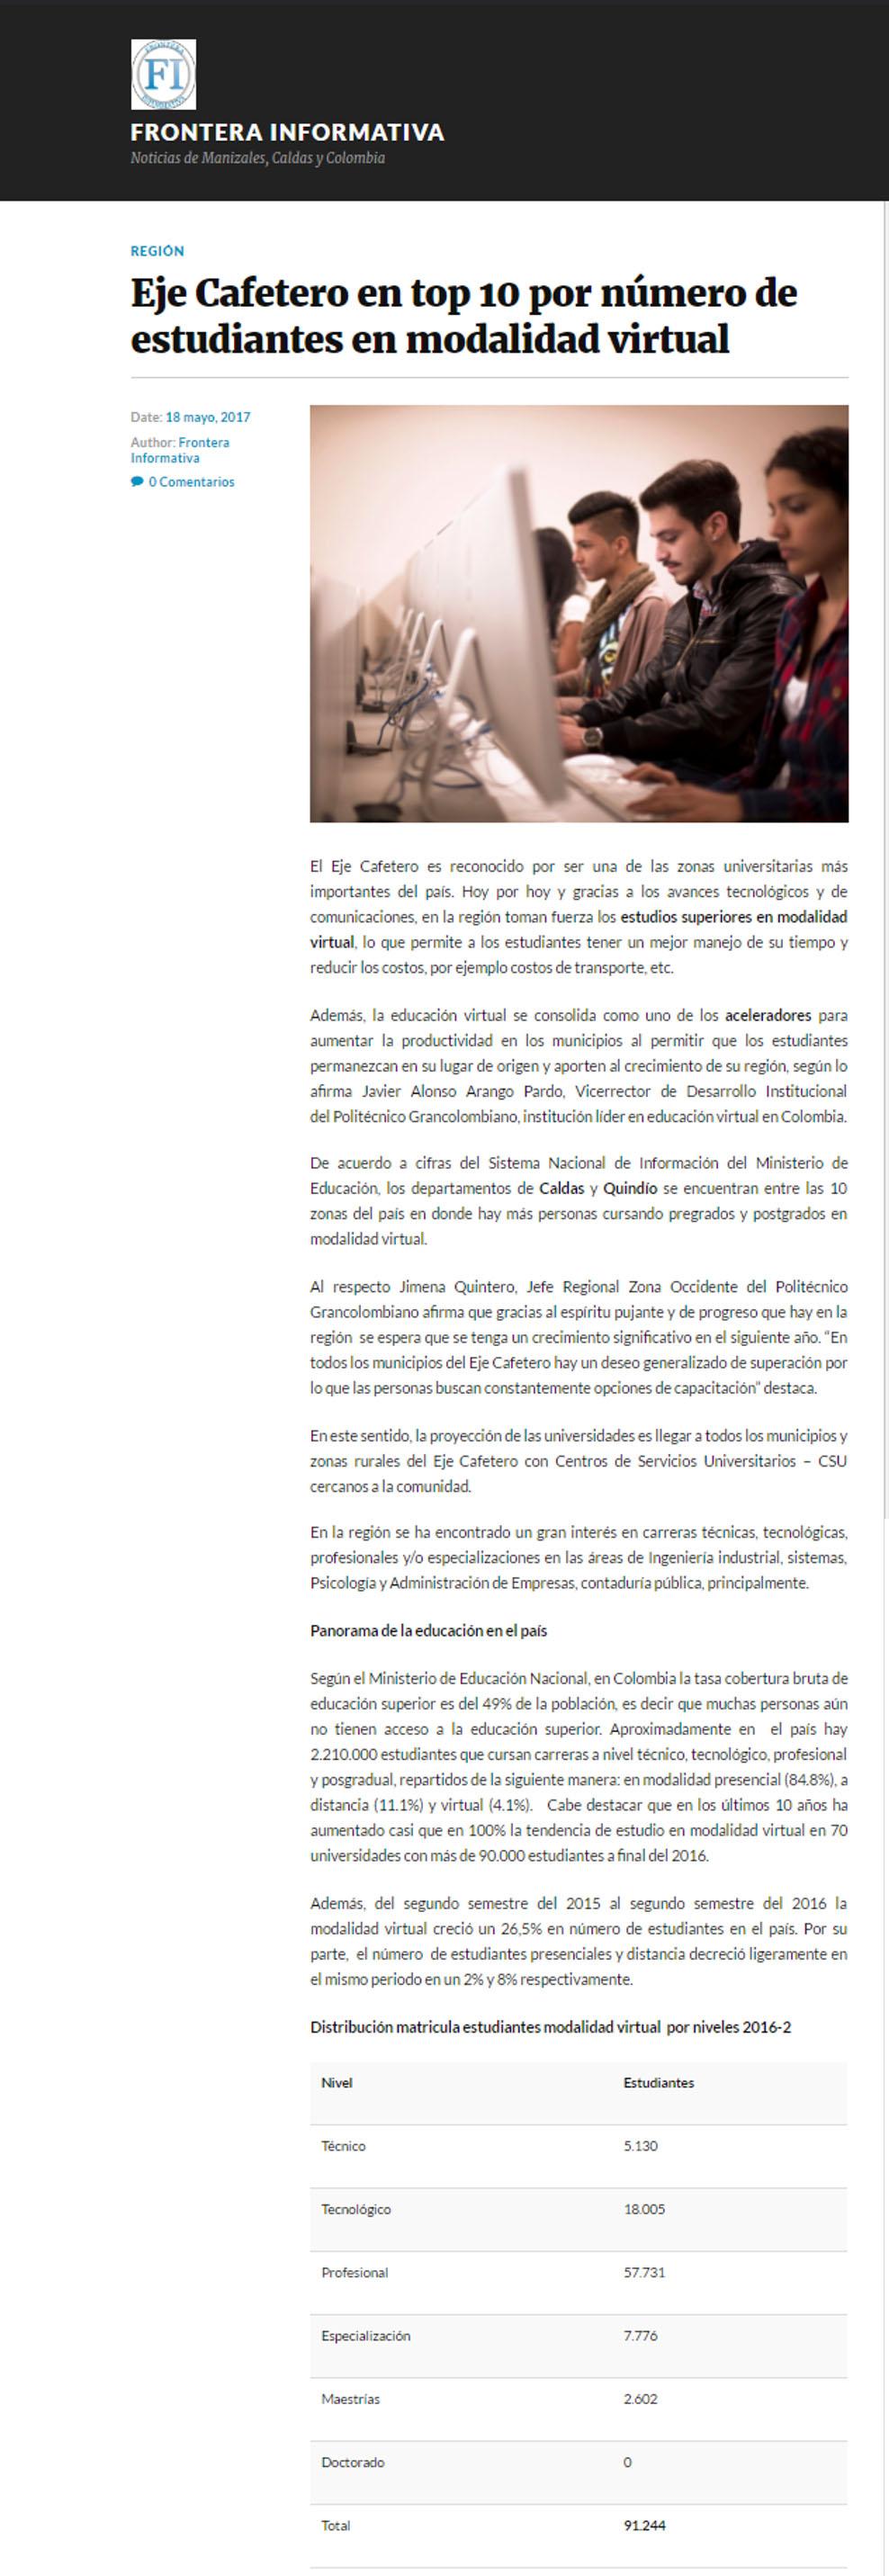 Frontera Informativa 18 de mayo